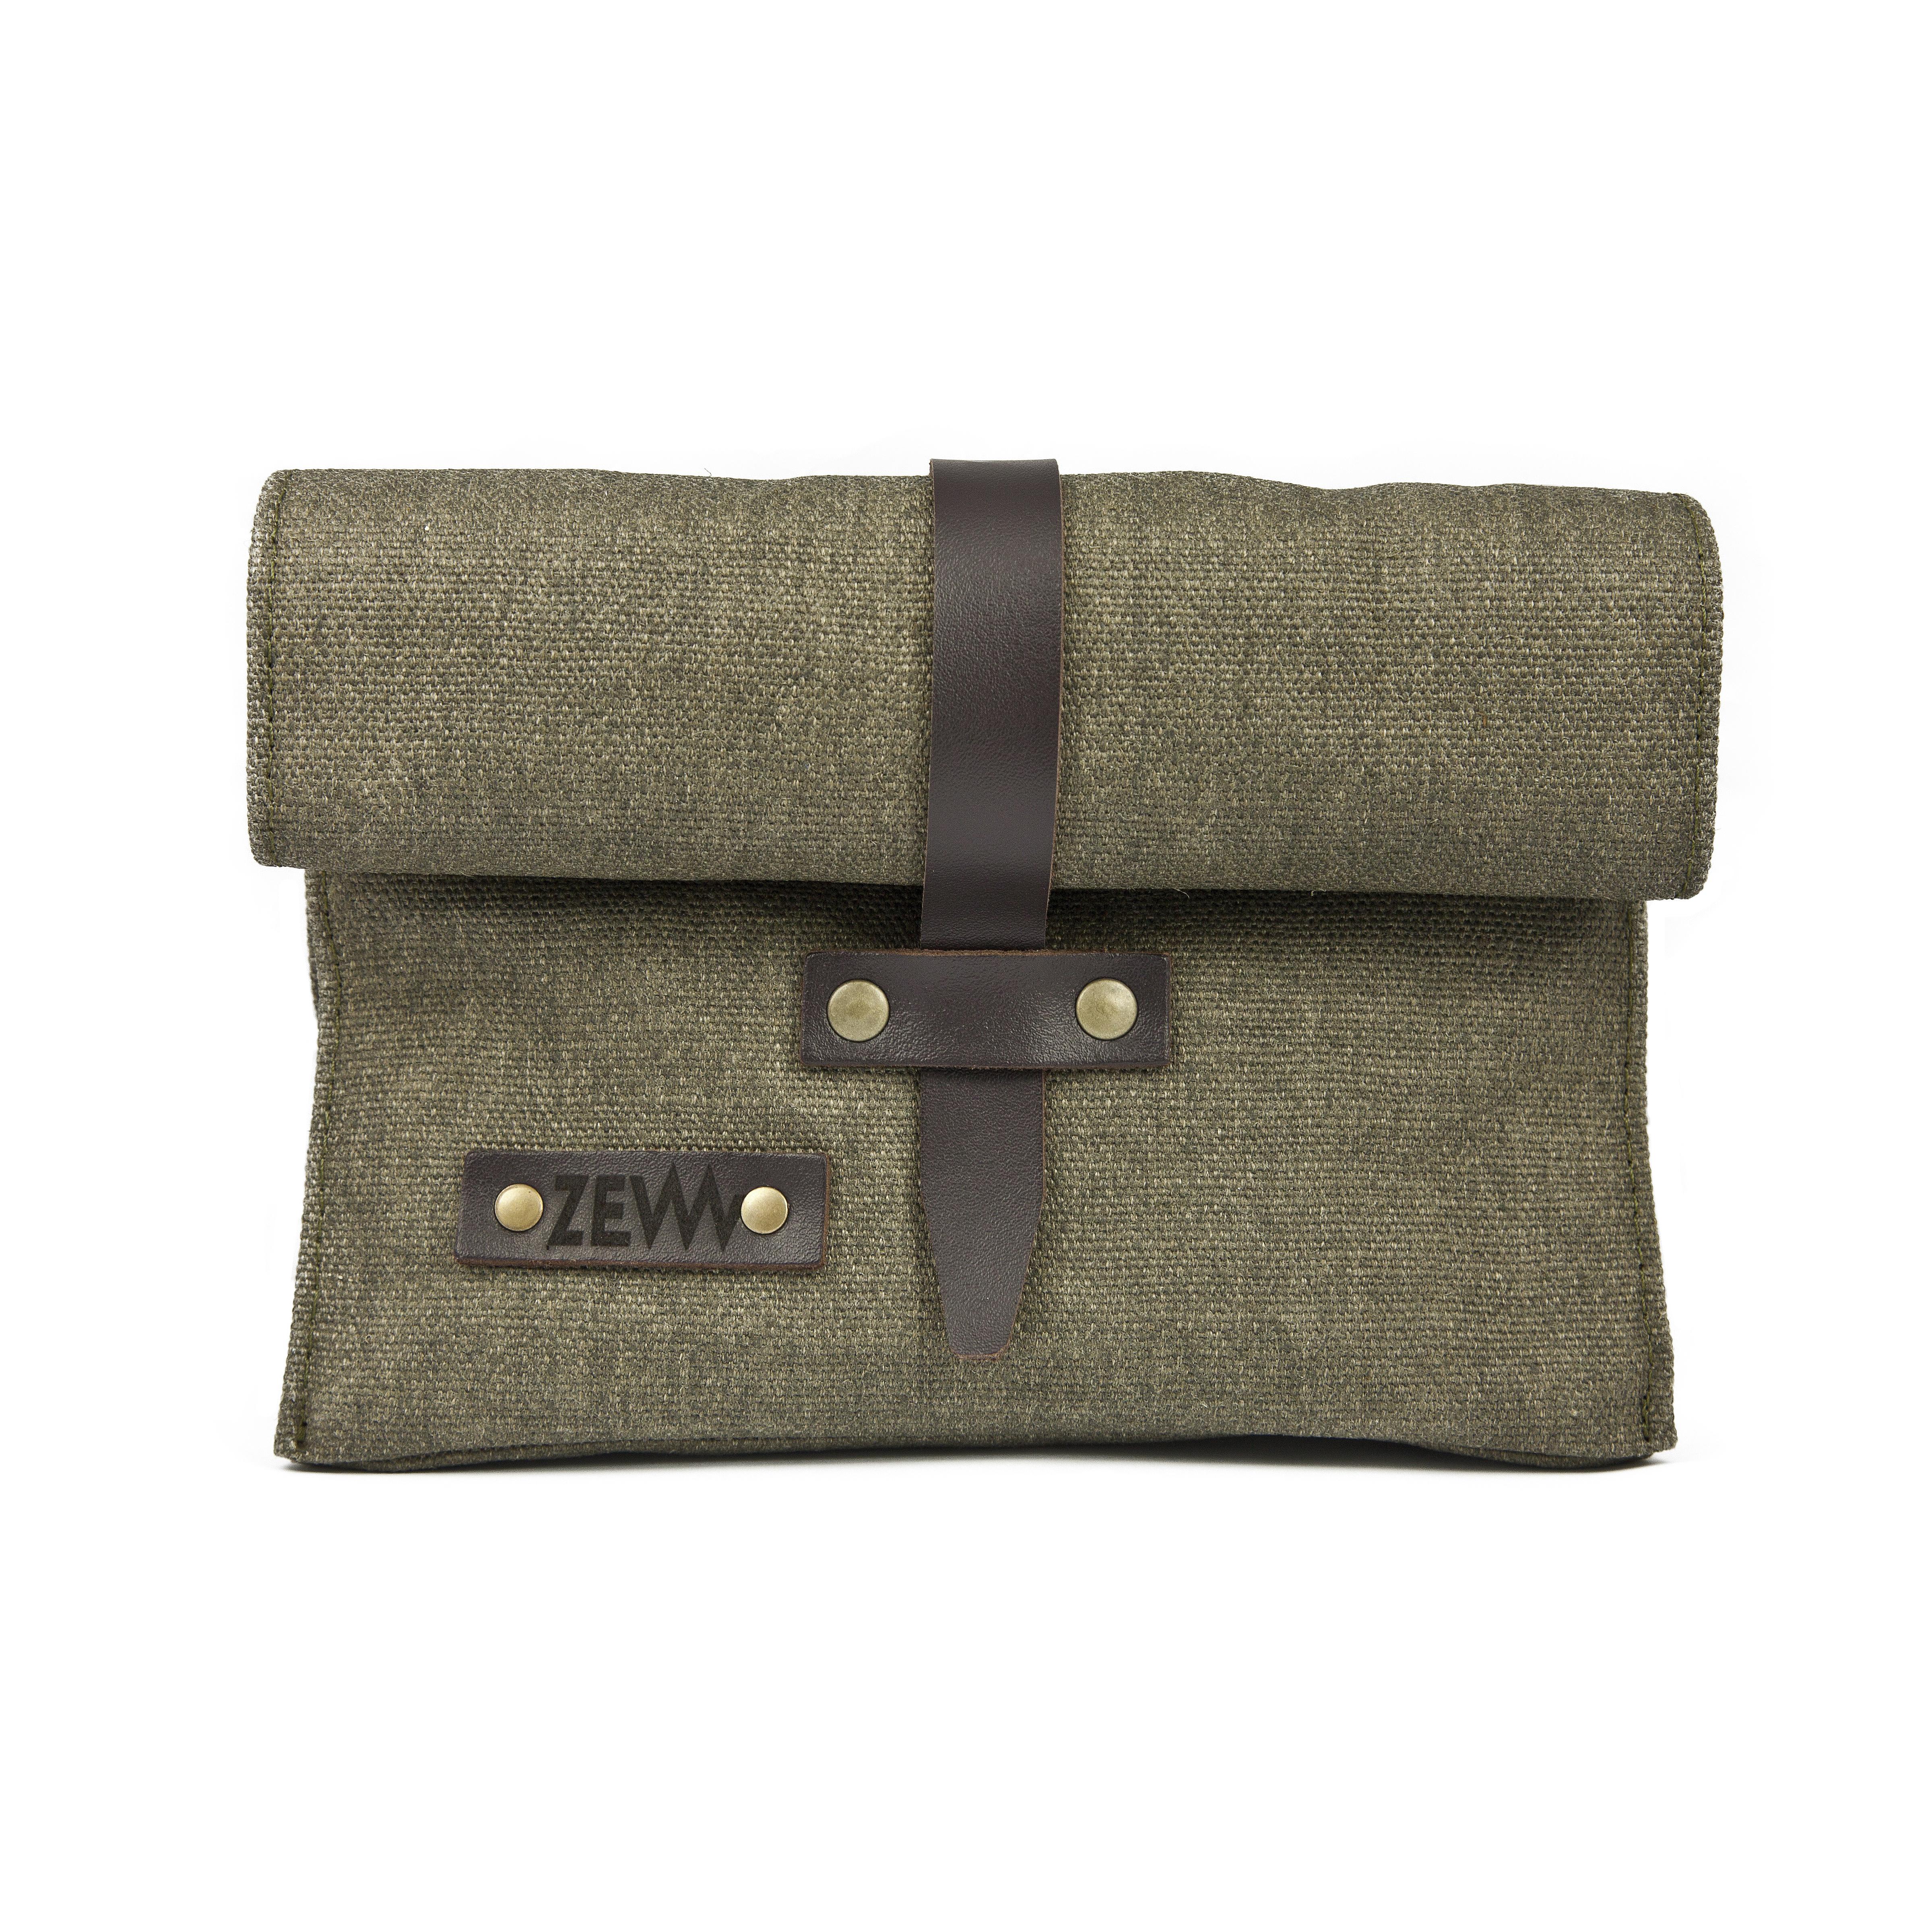 ZEW for men Cosmetic Bag - kozmetická taška